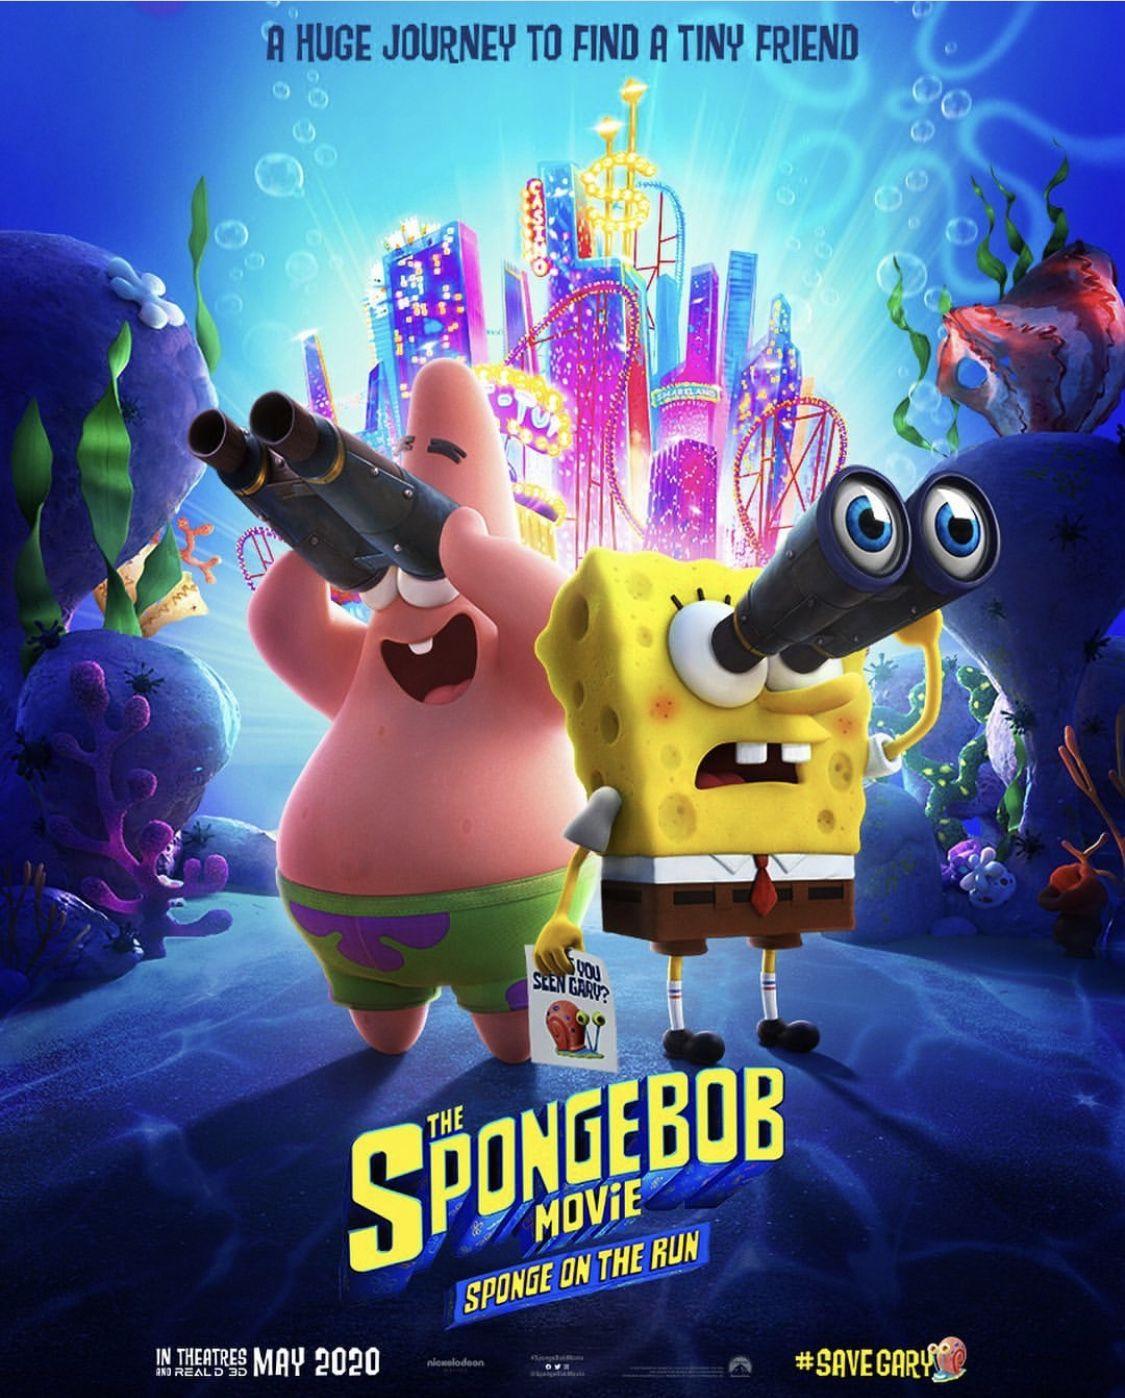 Pin By Zach Umar Durr On Movie Posters Spongebob Free Movies Online Movie Subtitles